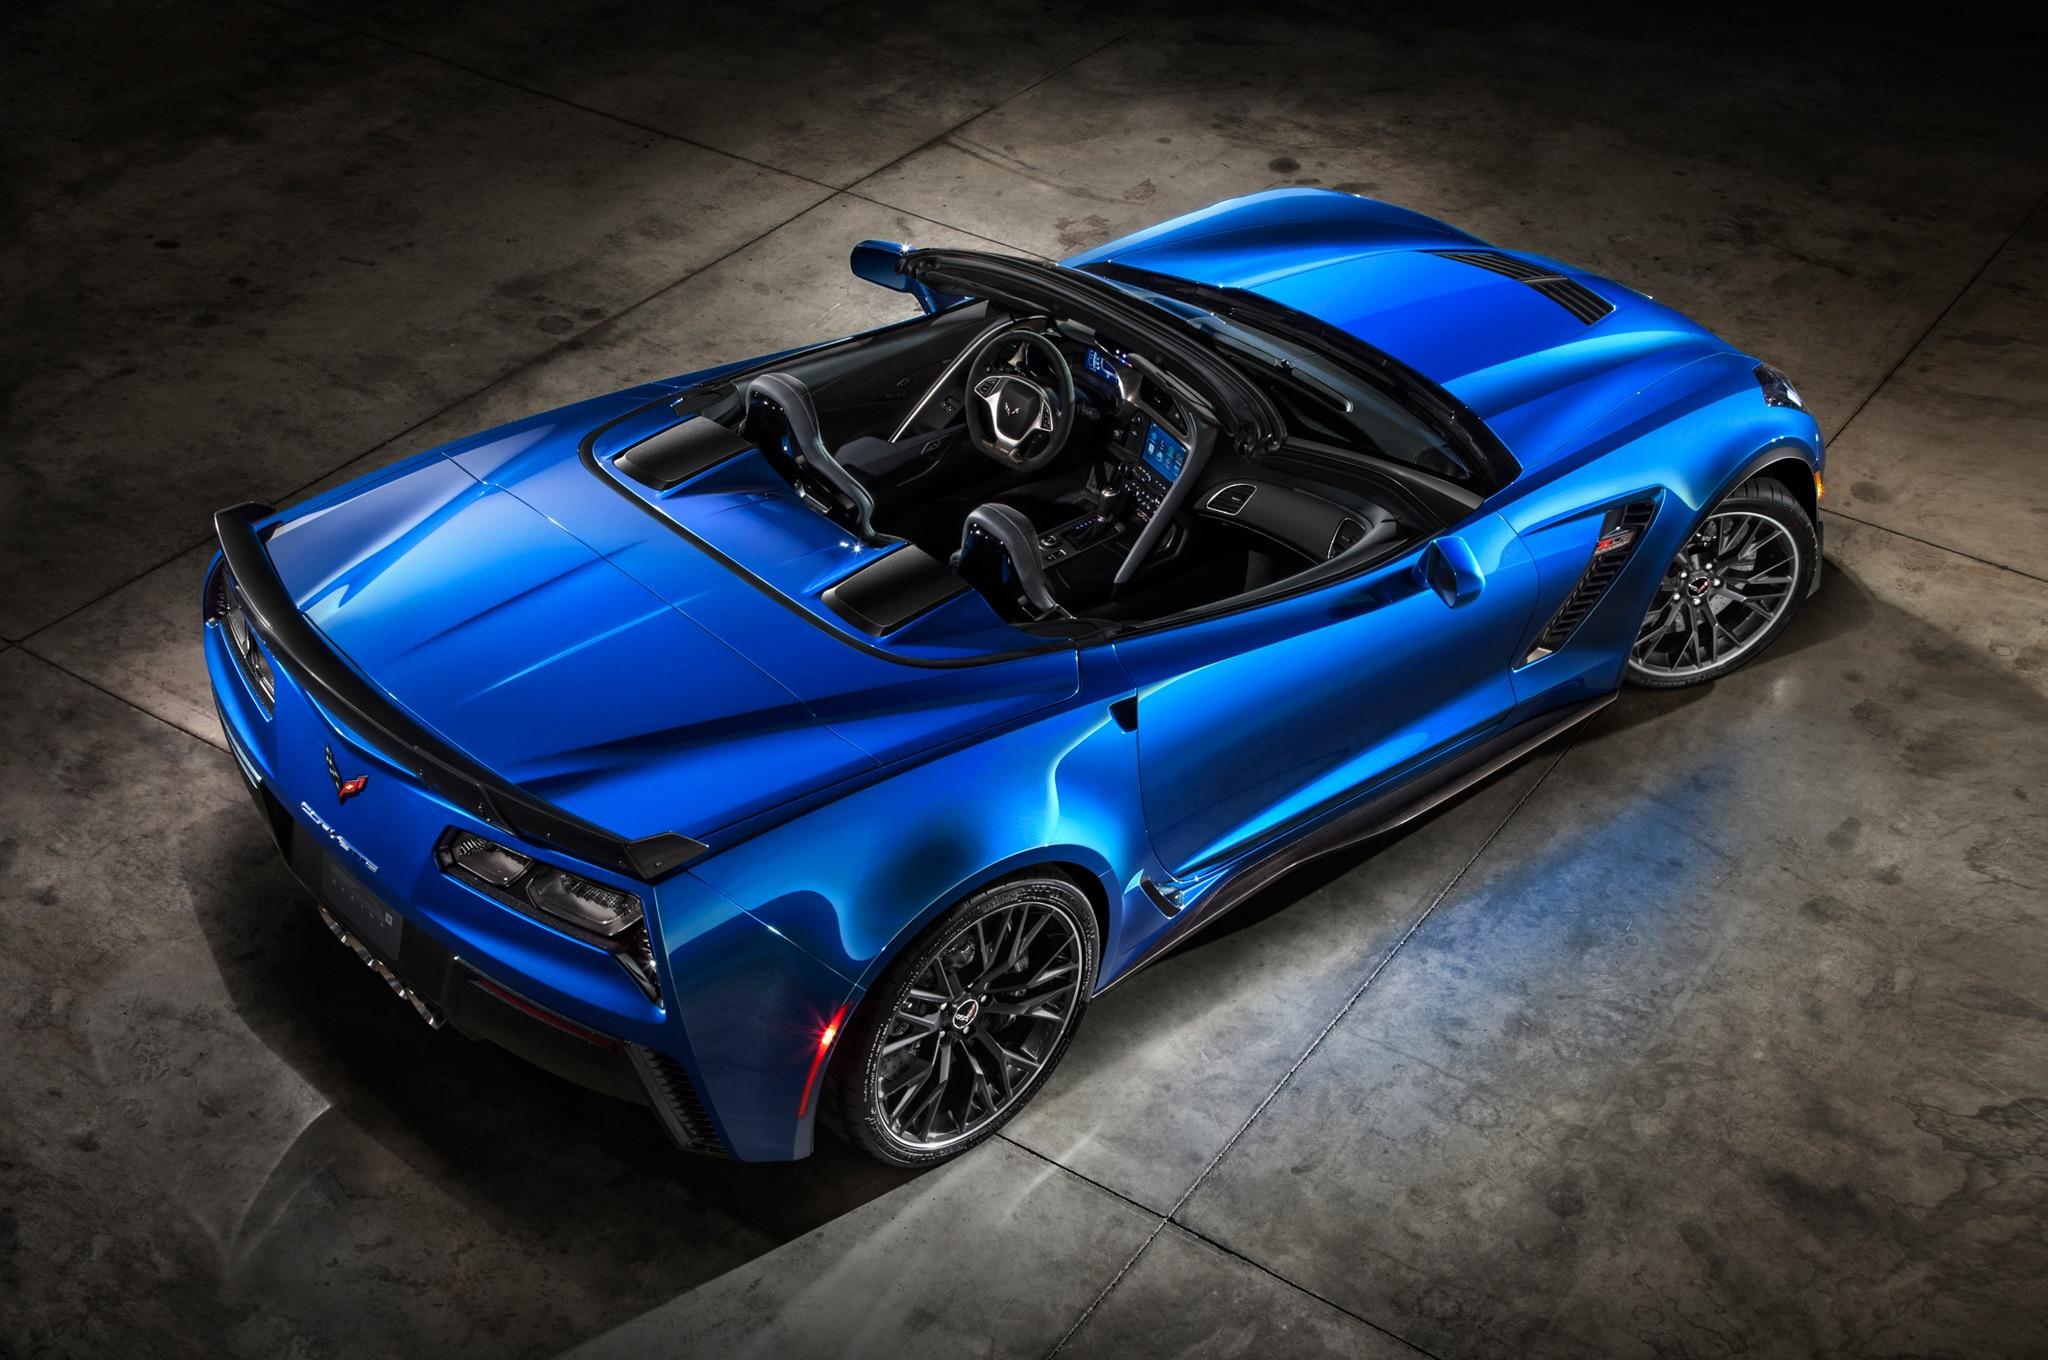 2015 chevrolet corvette z06 convertible from above corvette stingray convertible tail - Corvette 2015 Stingray Blue